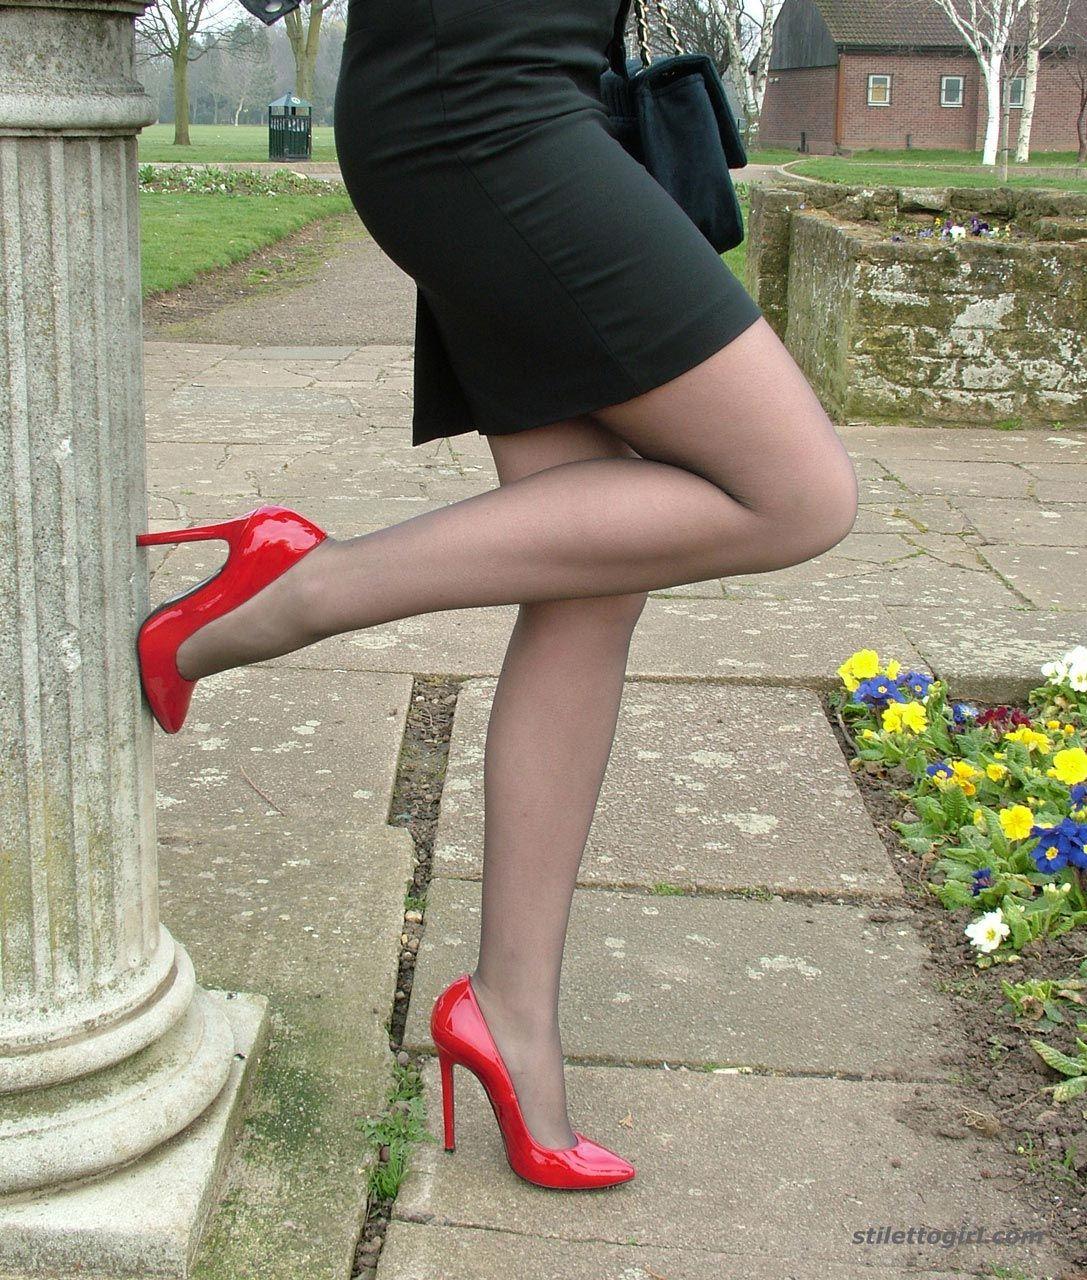 Red Stiletto Heels Showing Leg